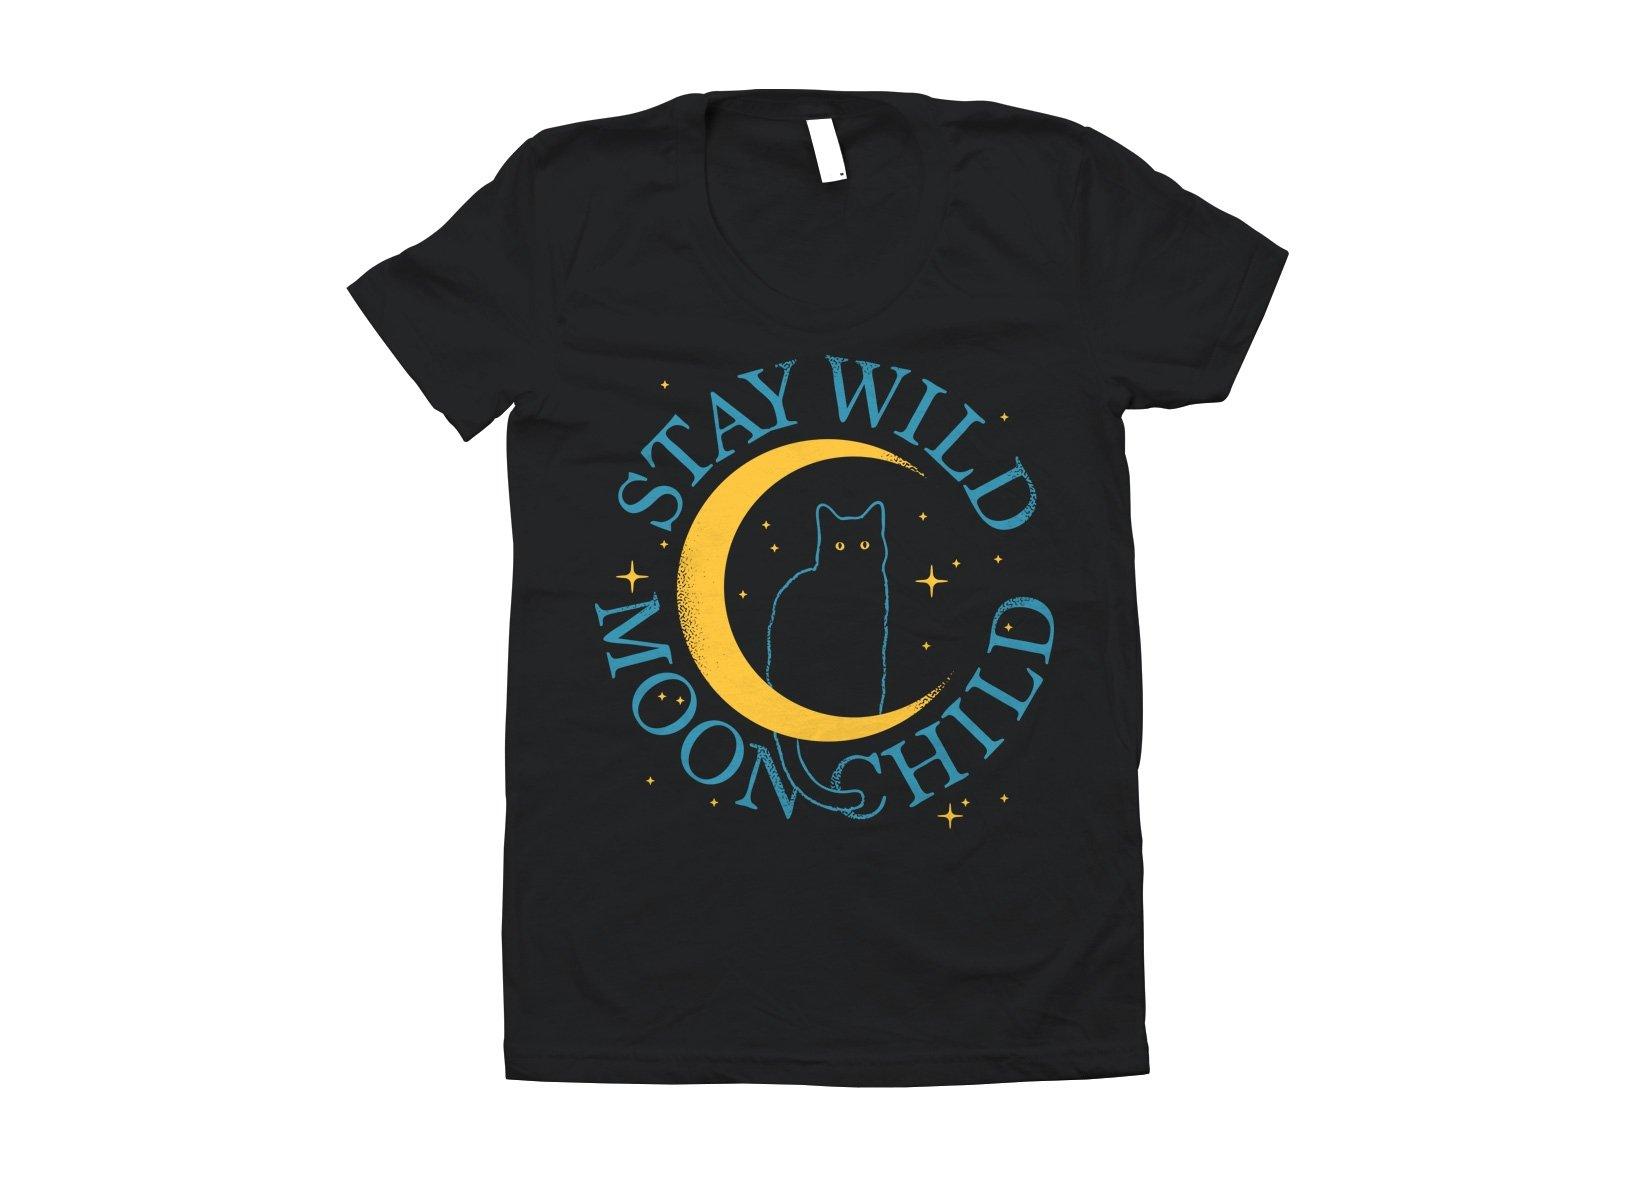 Stay Wild Moon Child on Juniors T-Shirt